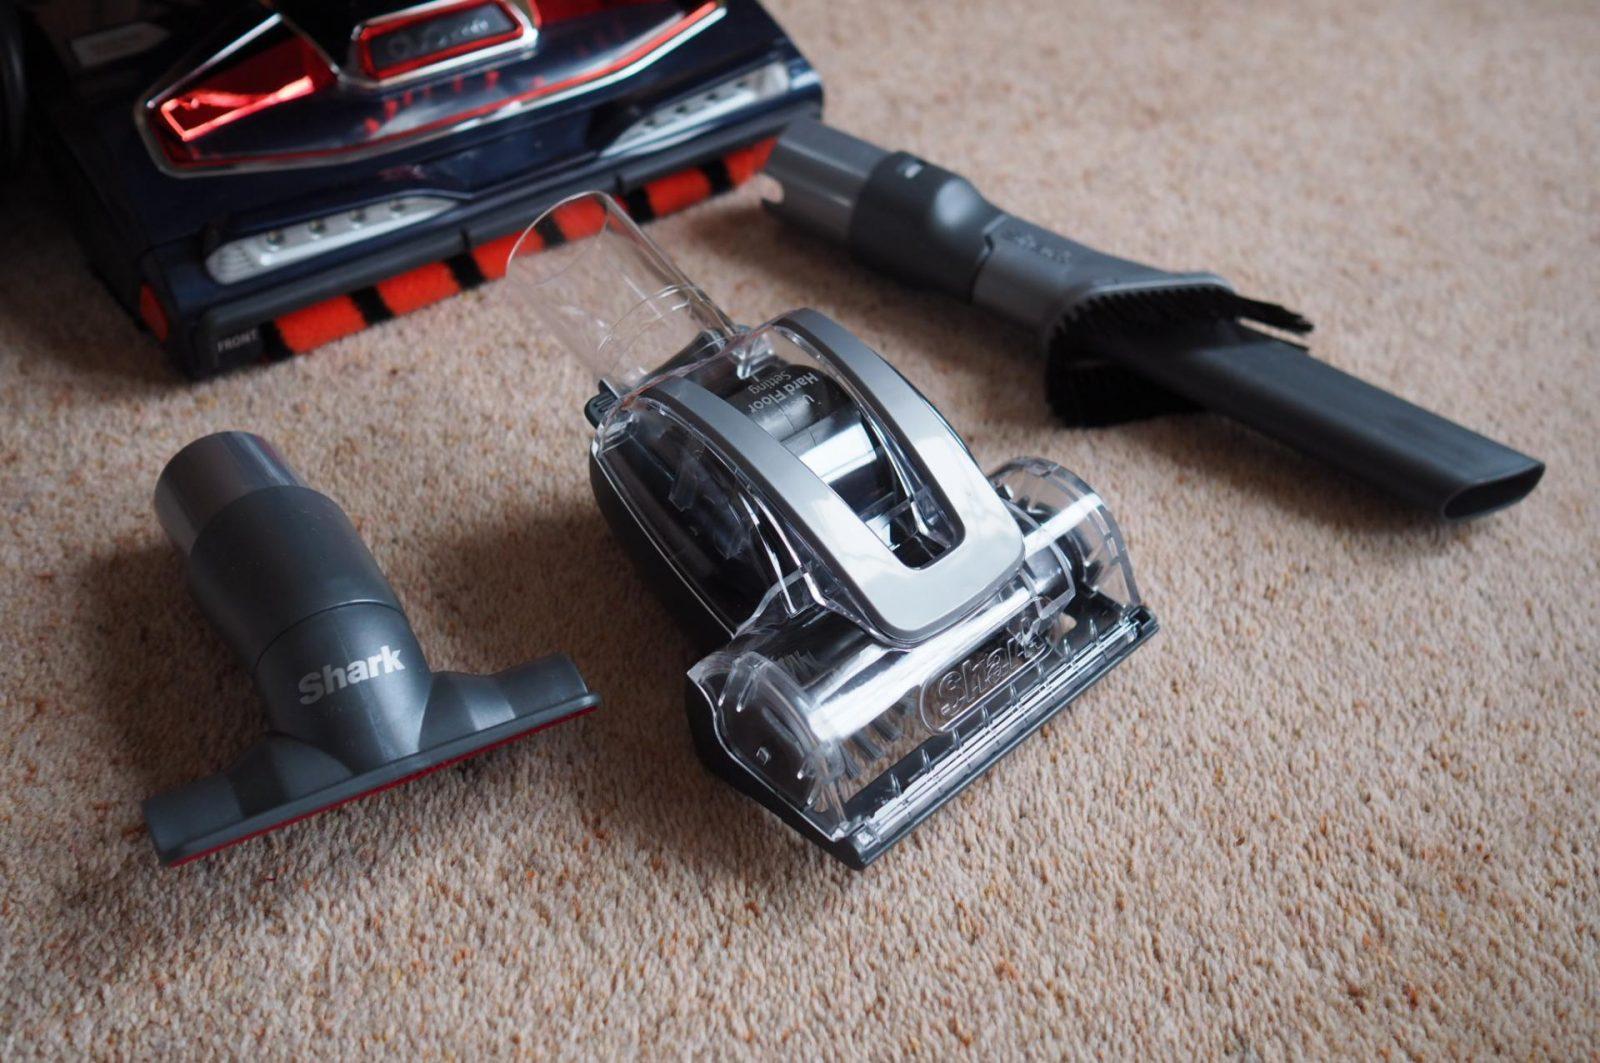 Shark Duoclean Nv801ukt Bagless Vacuum Cleaner